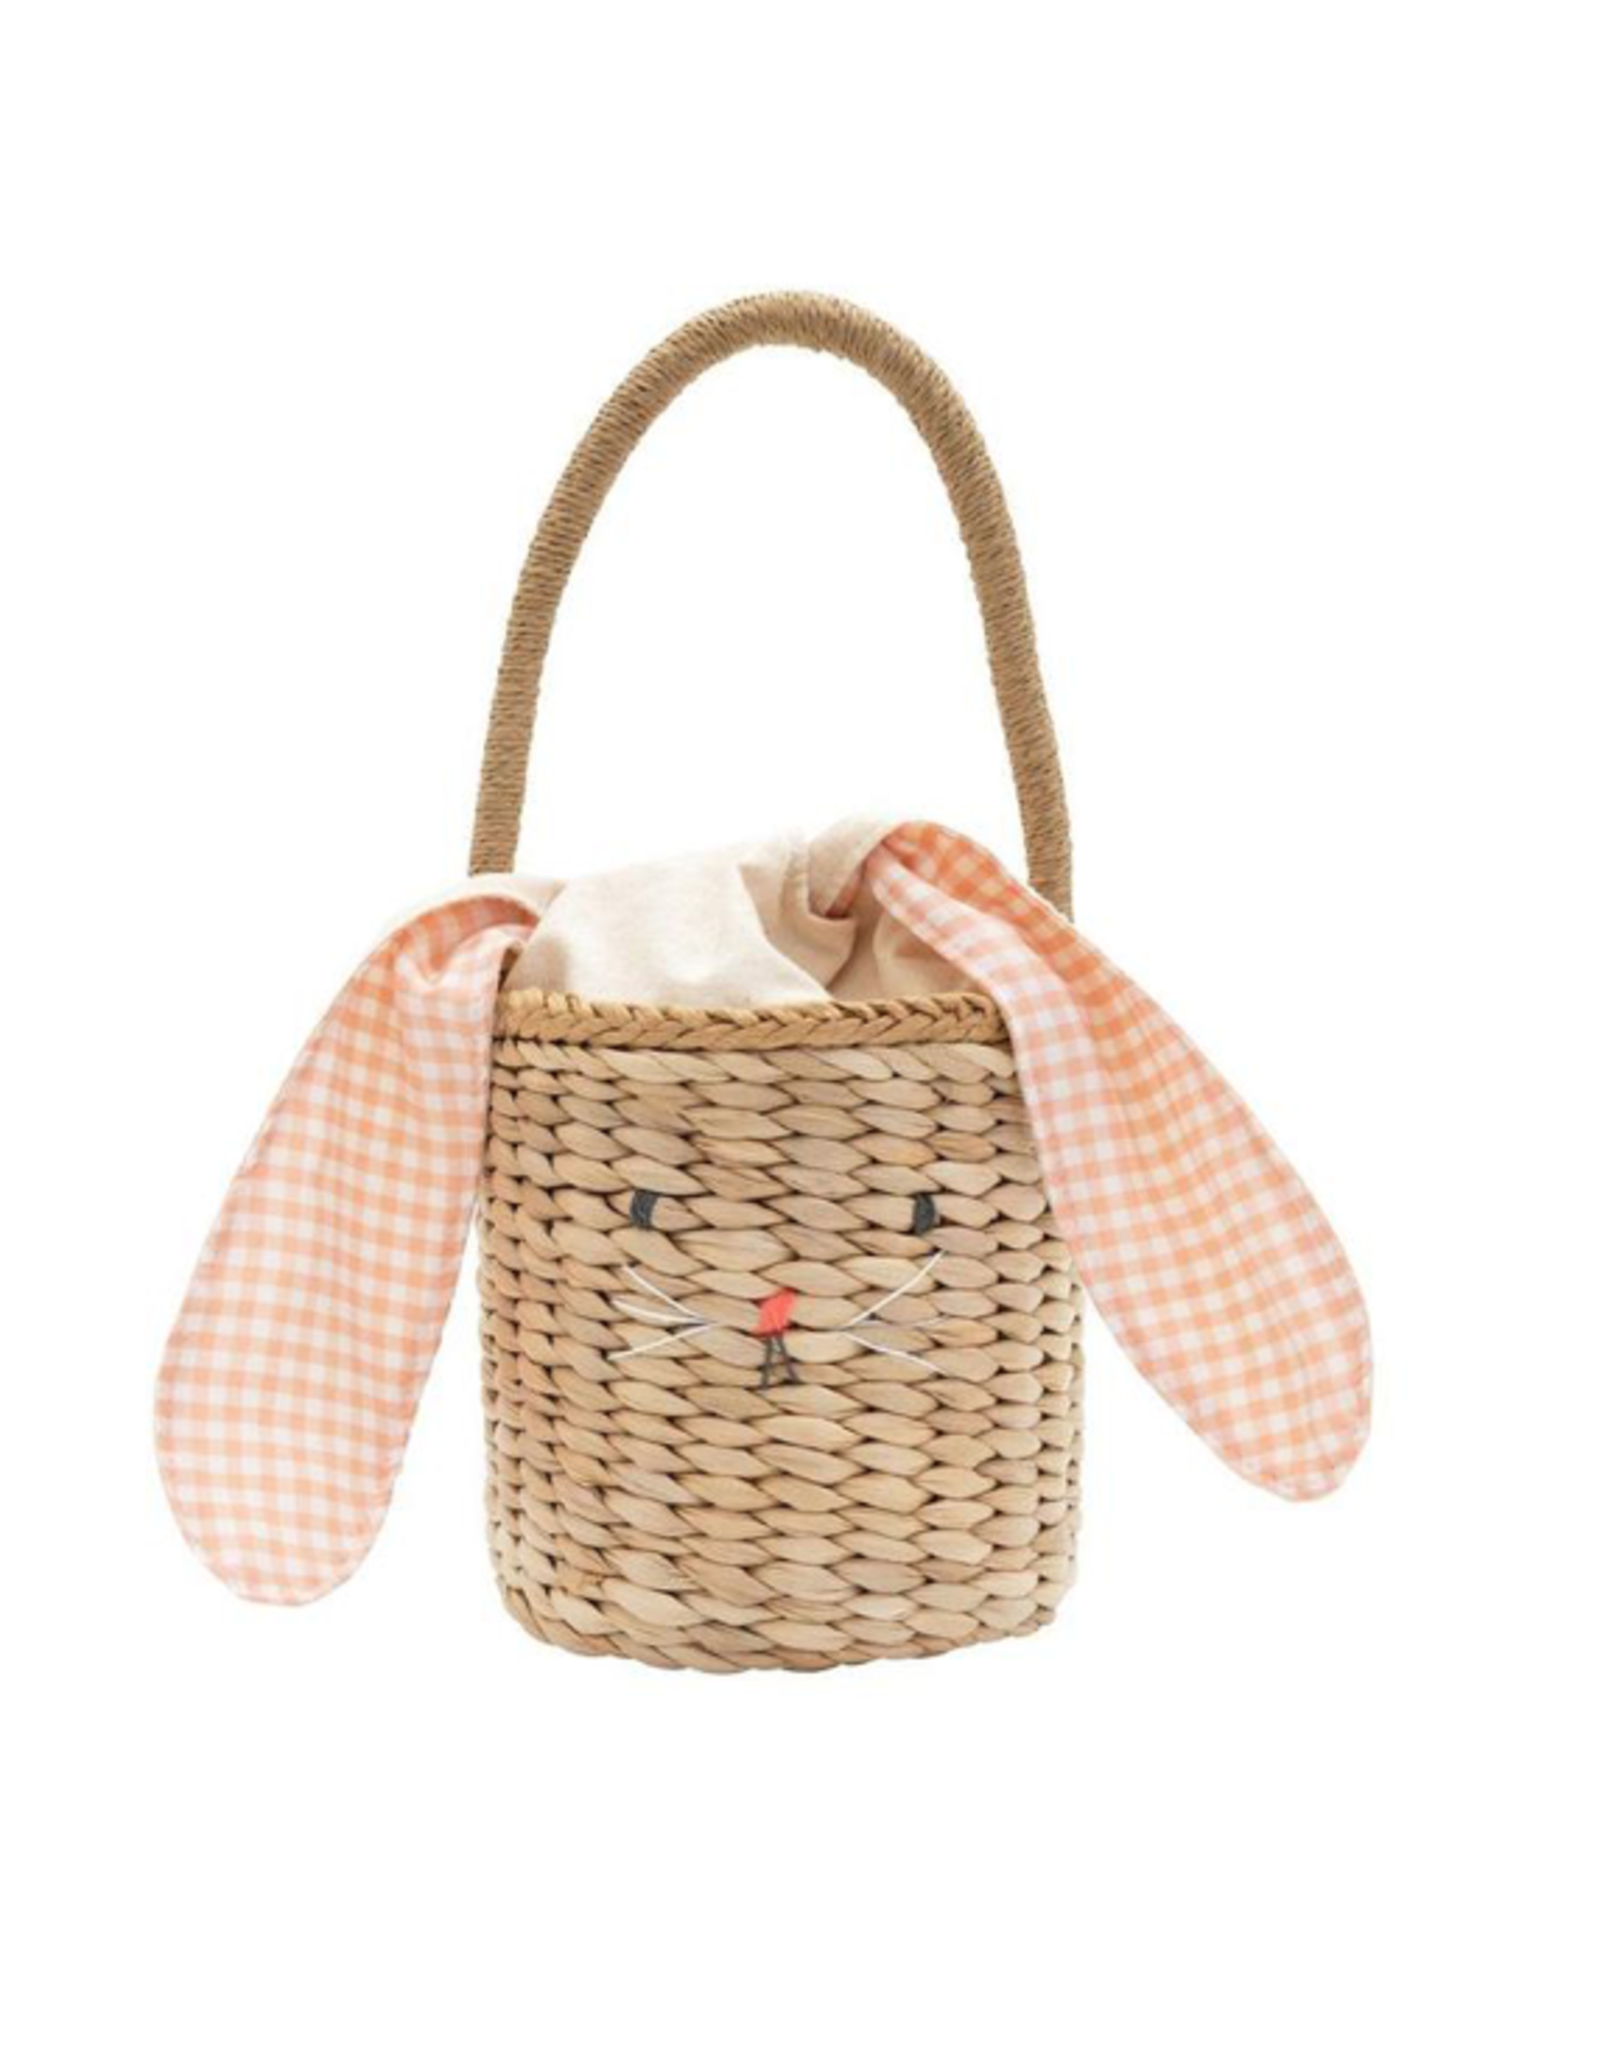 Meri Meri Bunny Woven Straw Bag